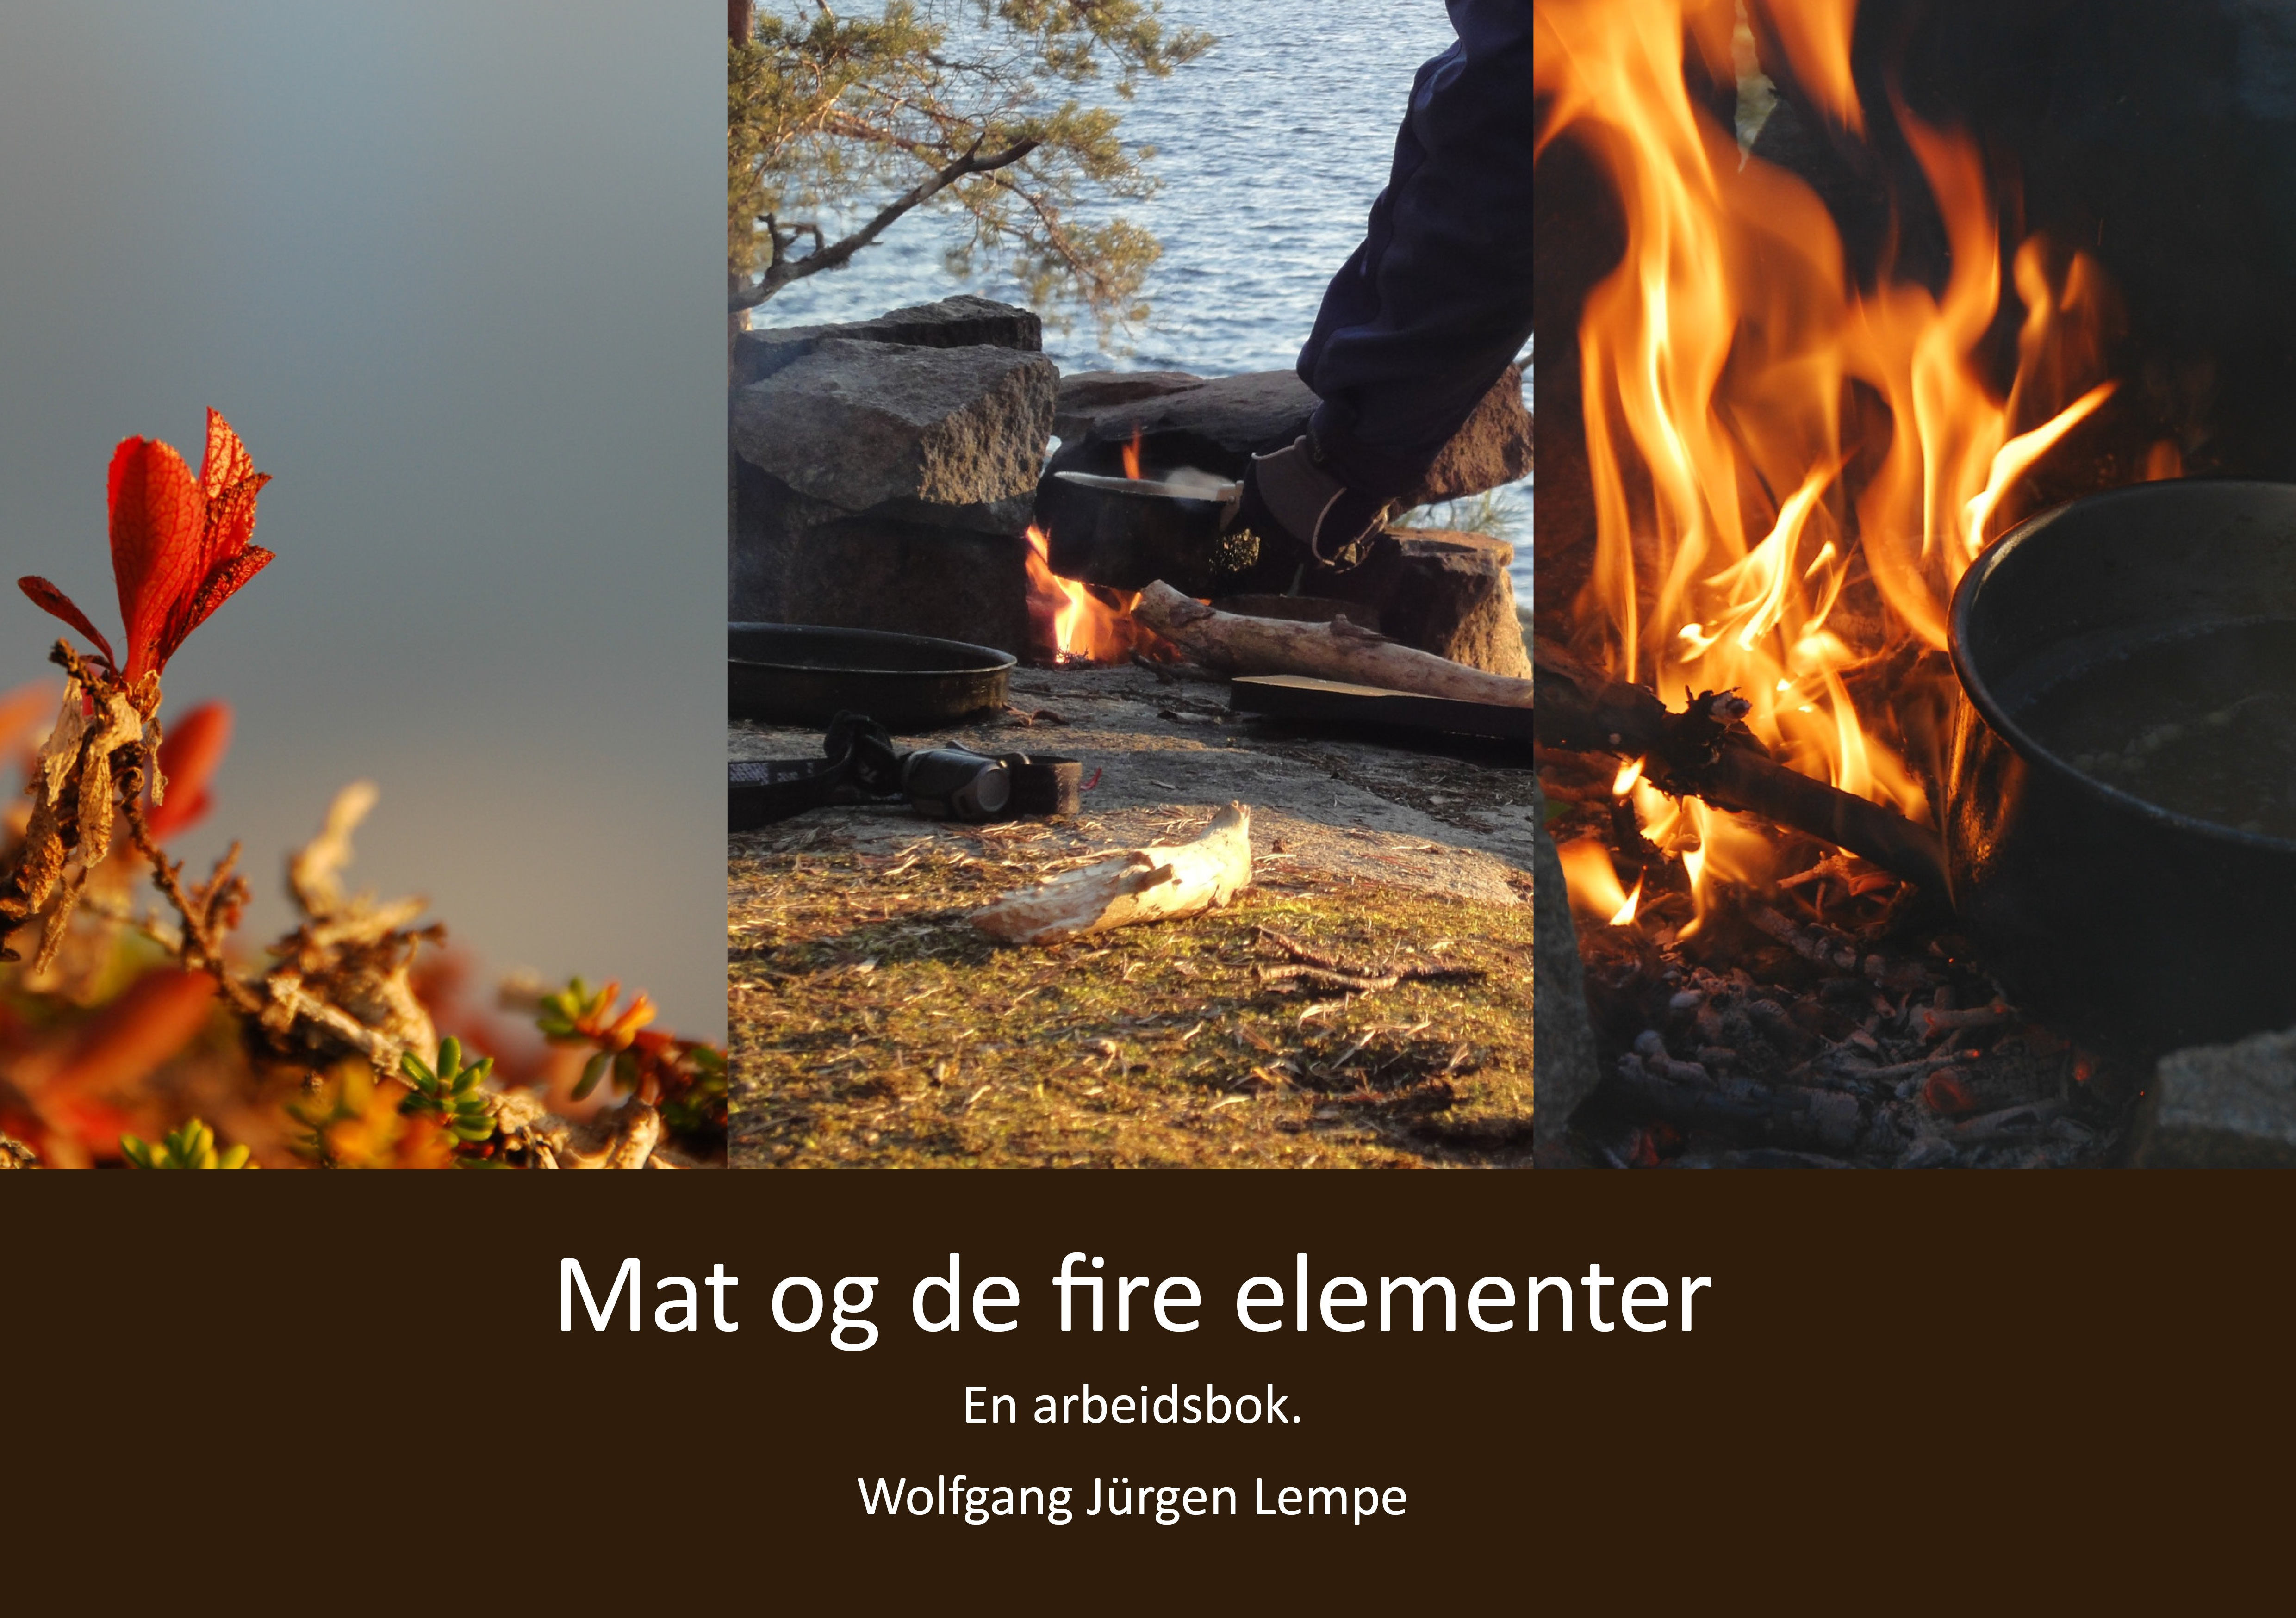 Mat og de fire elementer av Wolfgang Jürgen Lempe